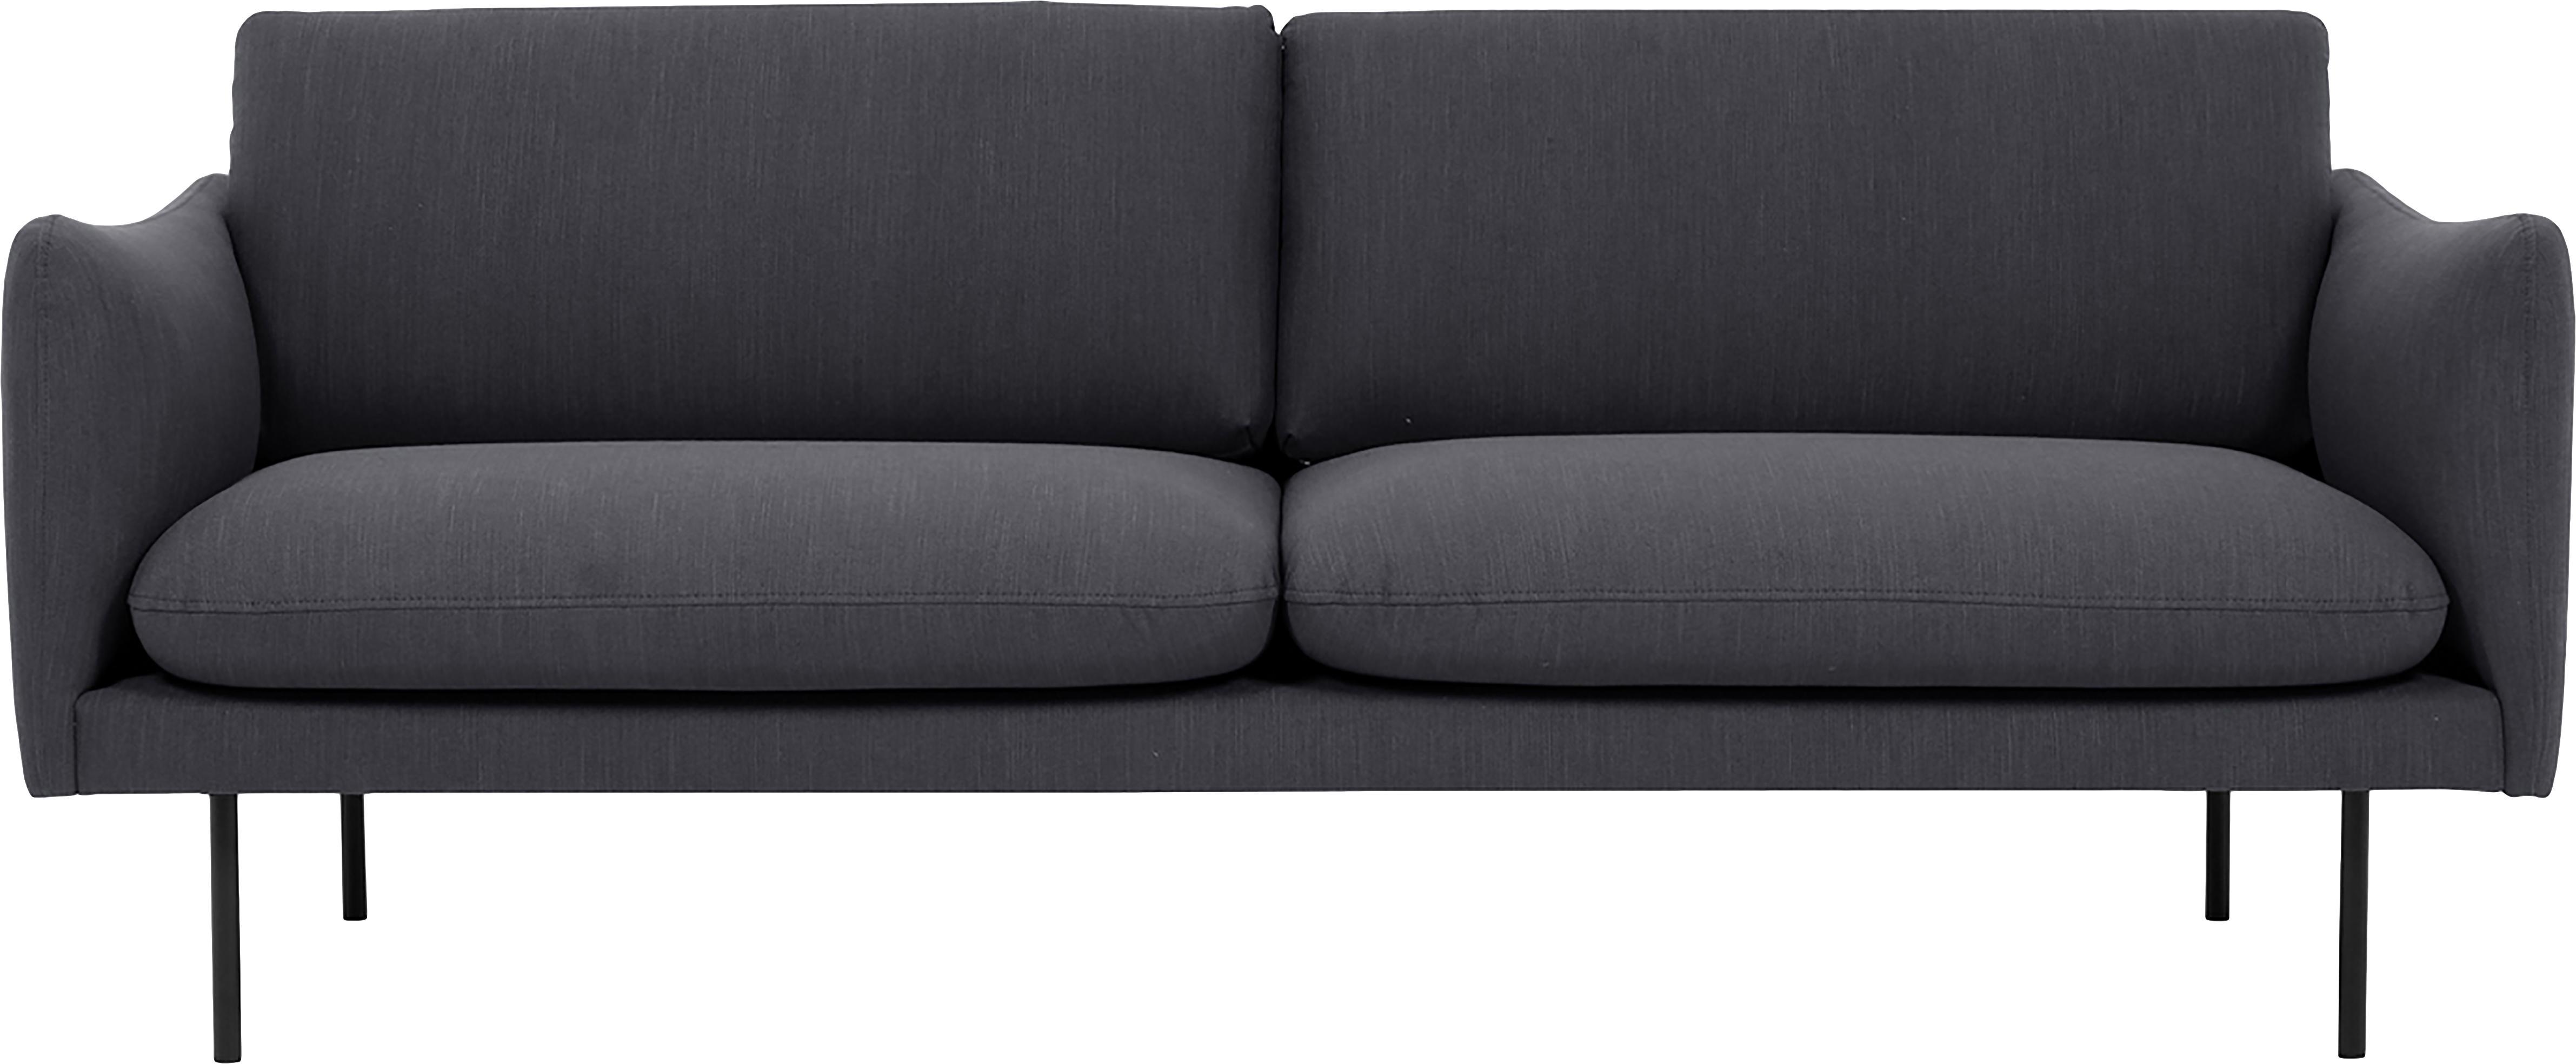 Sofa Moby (2-Sitzer), Bezug: Polyester Der hochwertige, Gestell: Massives Kiefernholz, Füße: Metall, pulverbeschichtet, Webstoff Dunkelgrau, B 170 x T 95 cm